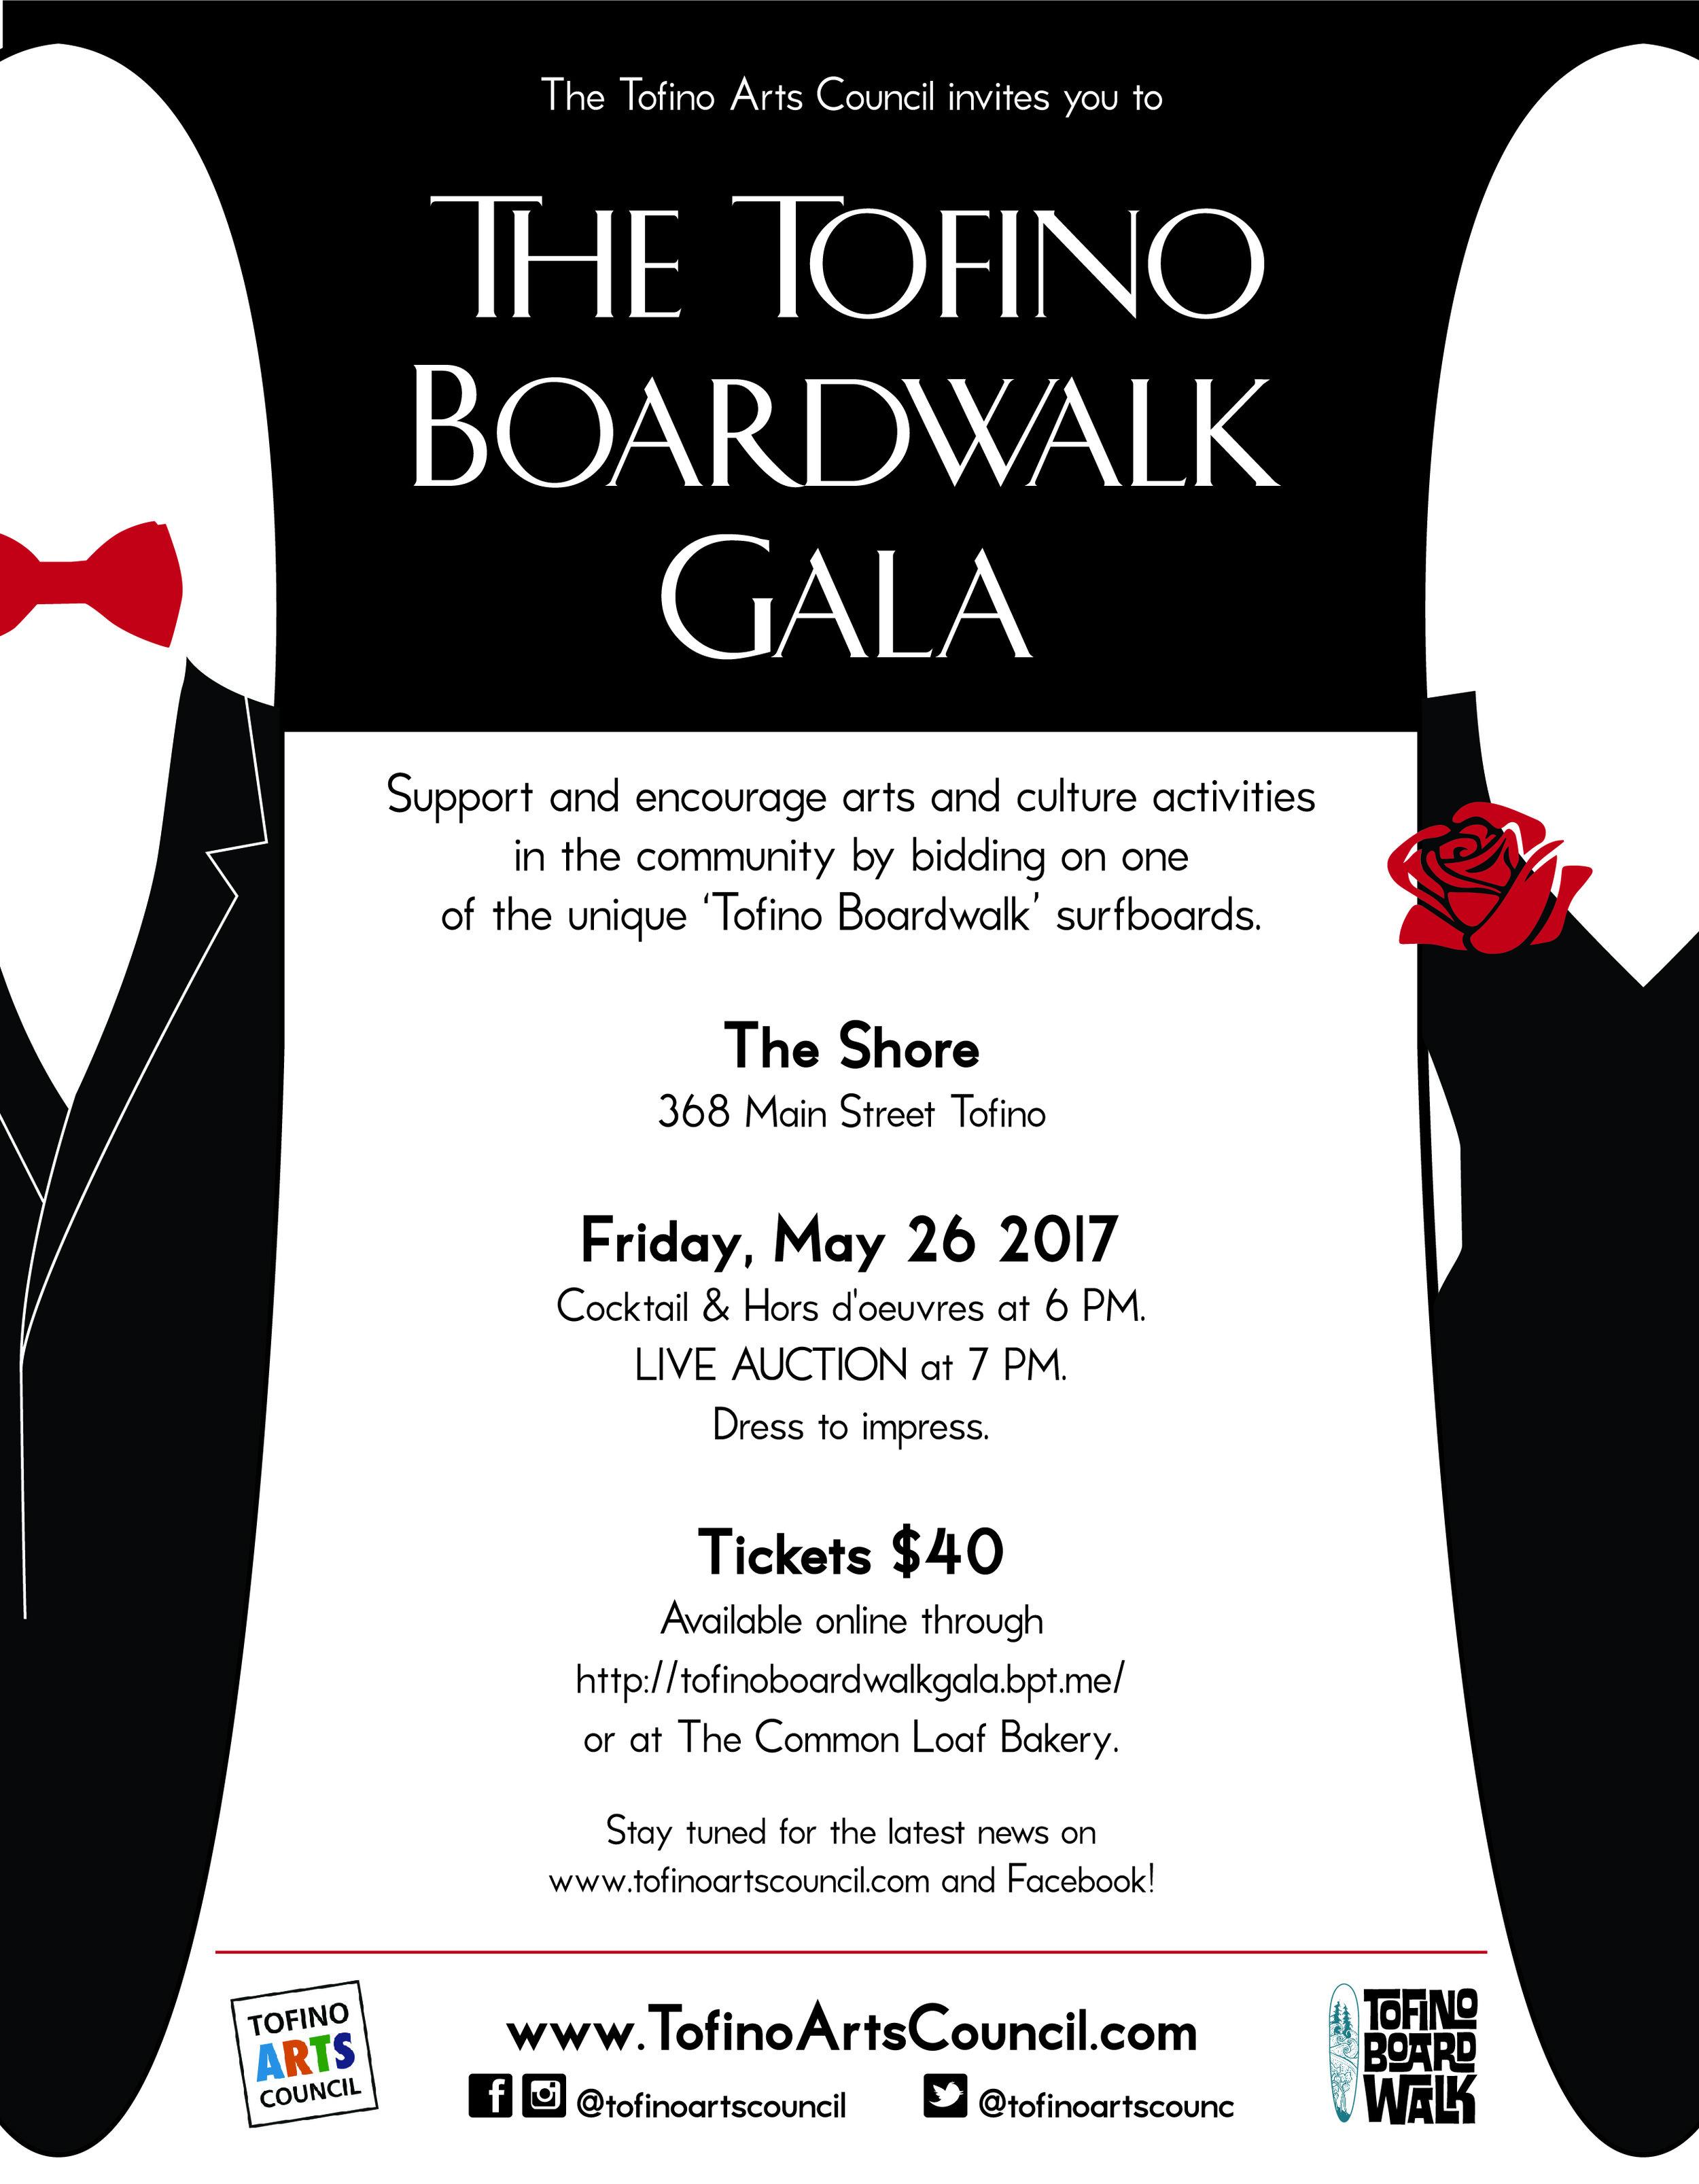 Tofino Boardwalk Gala